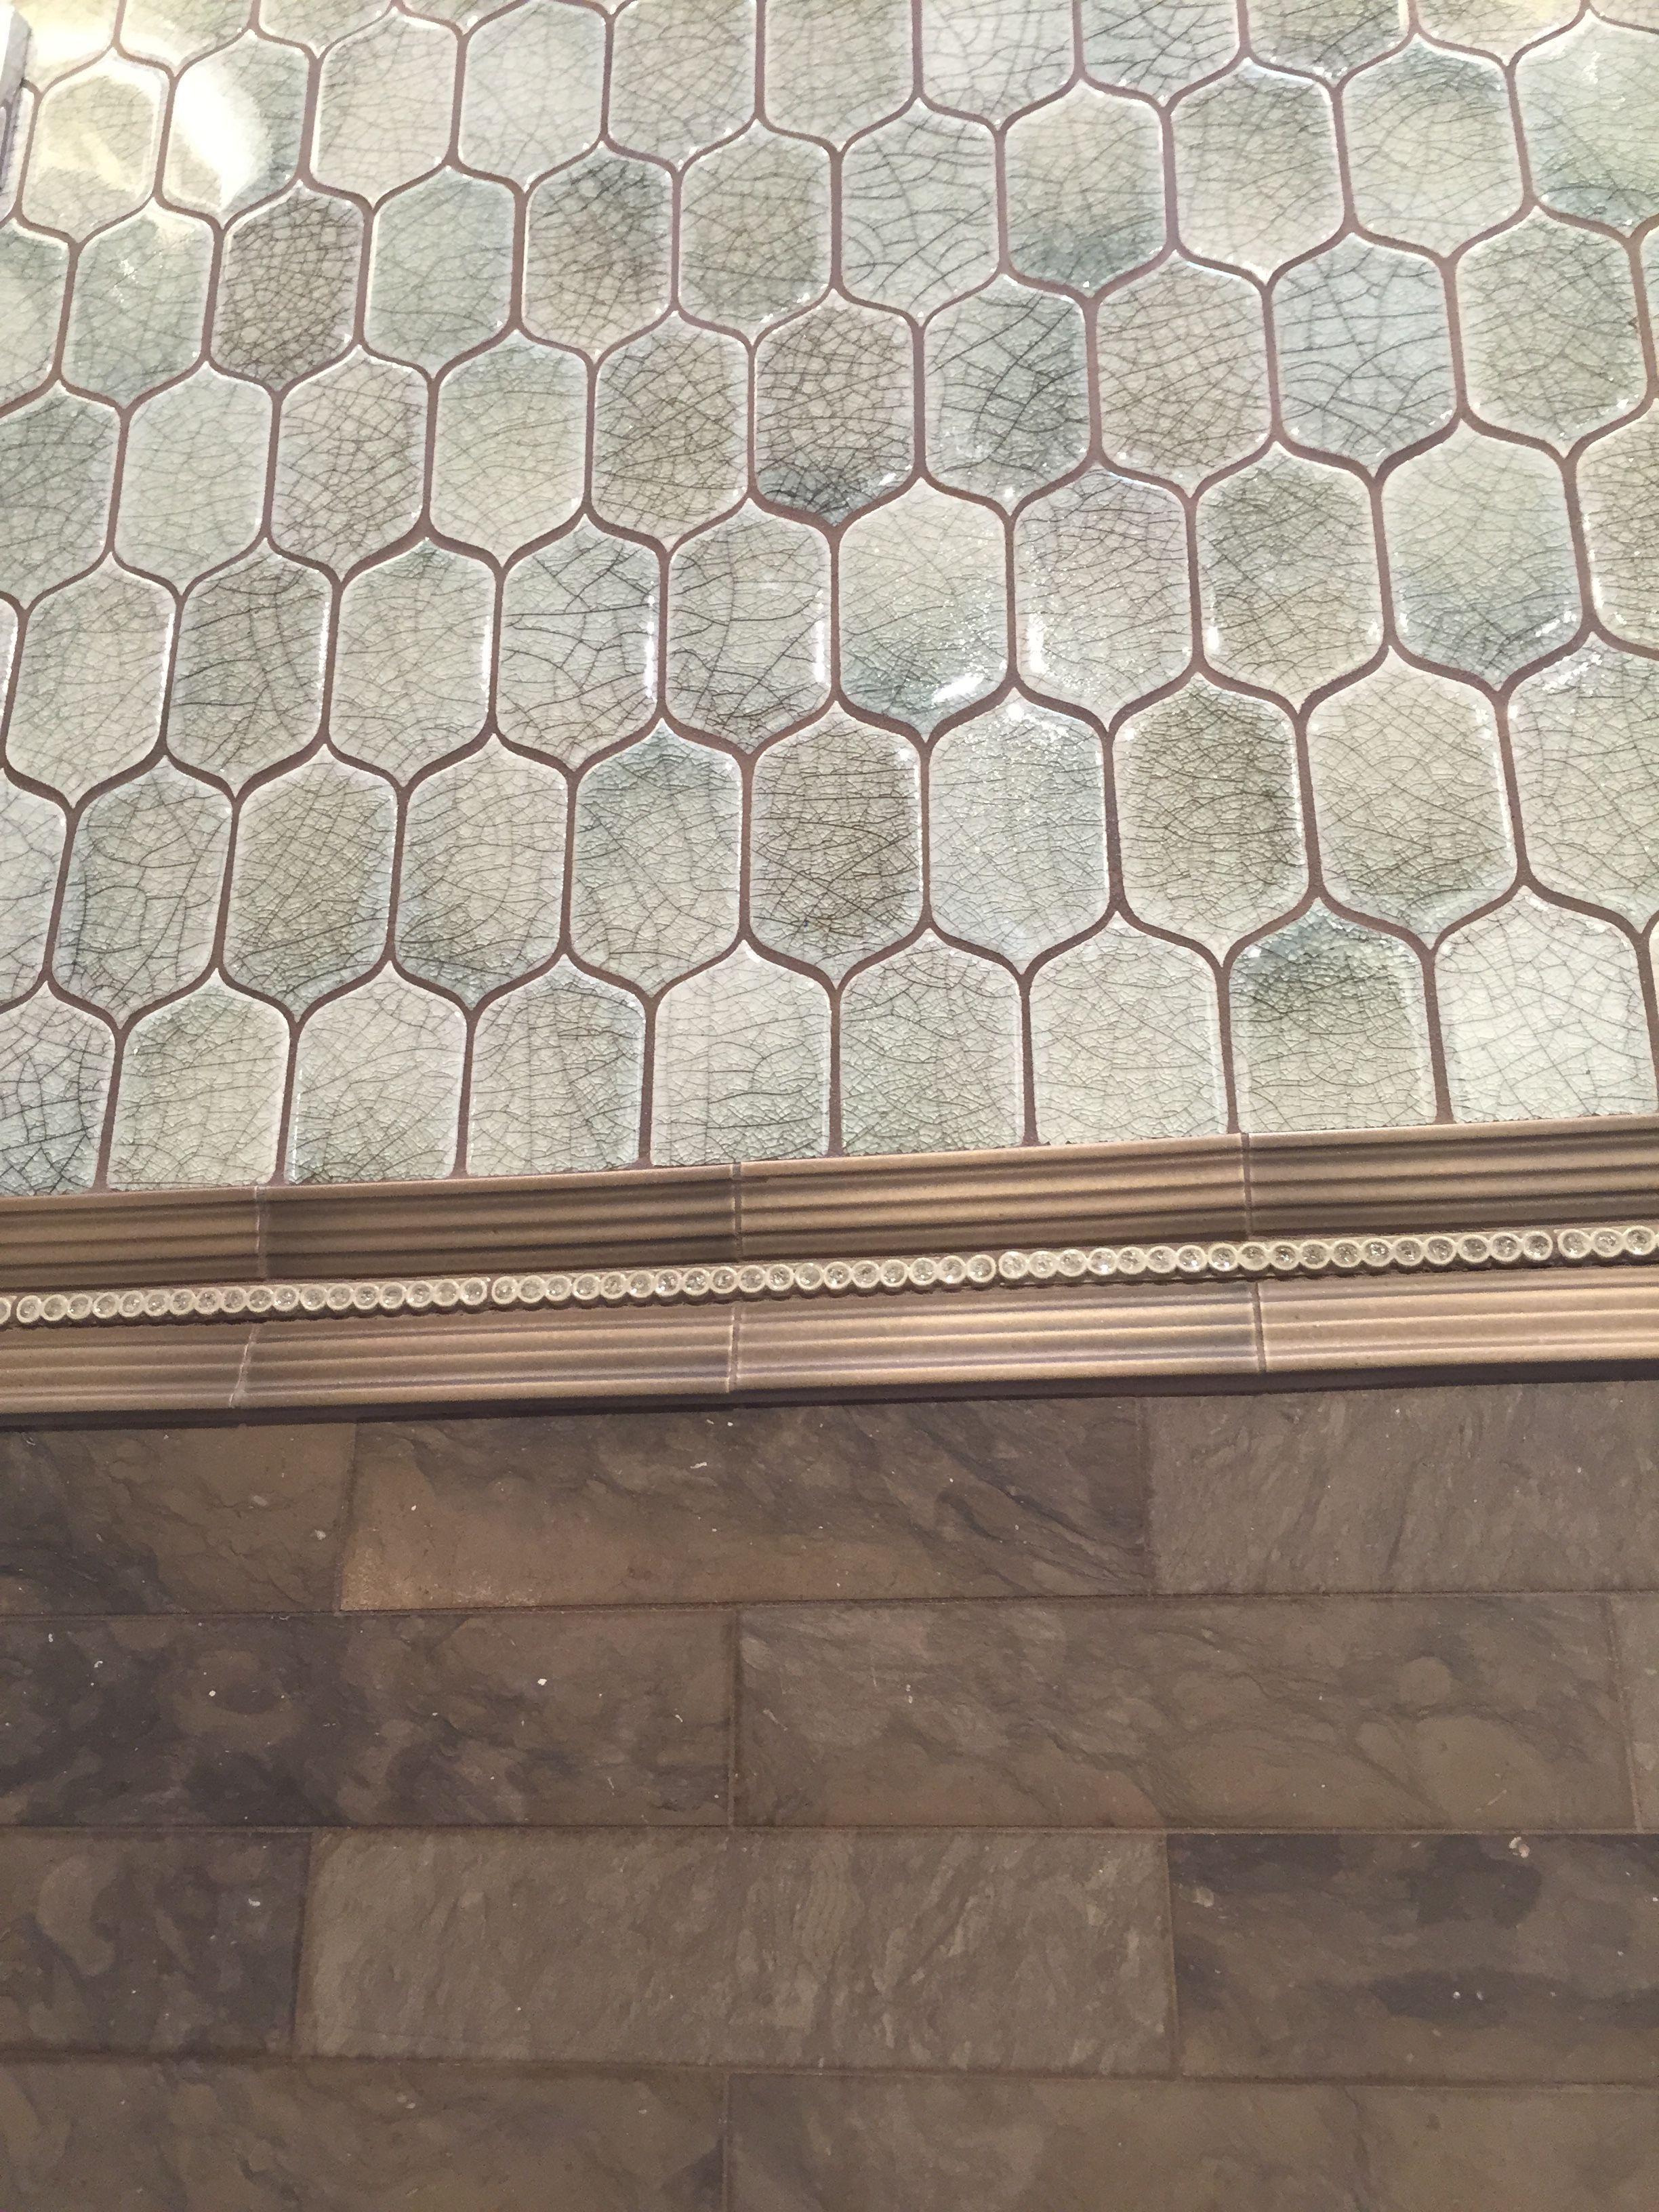 Timeless Subway Tile Bonus Beyond Subway Tile Crackle Tile Subway Tile Tiles